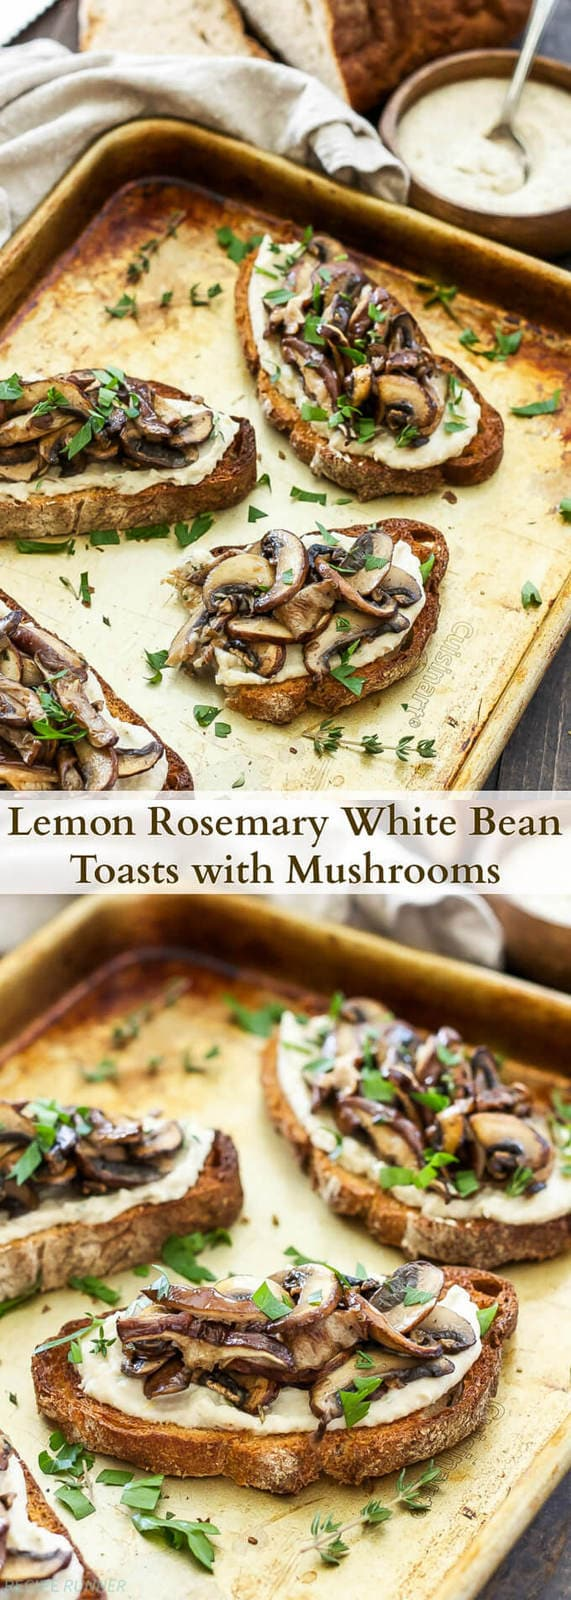 Lemon Rosemary White Bean Toasts with Mushrooms